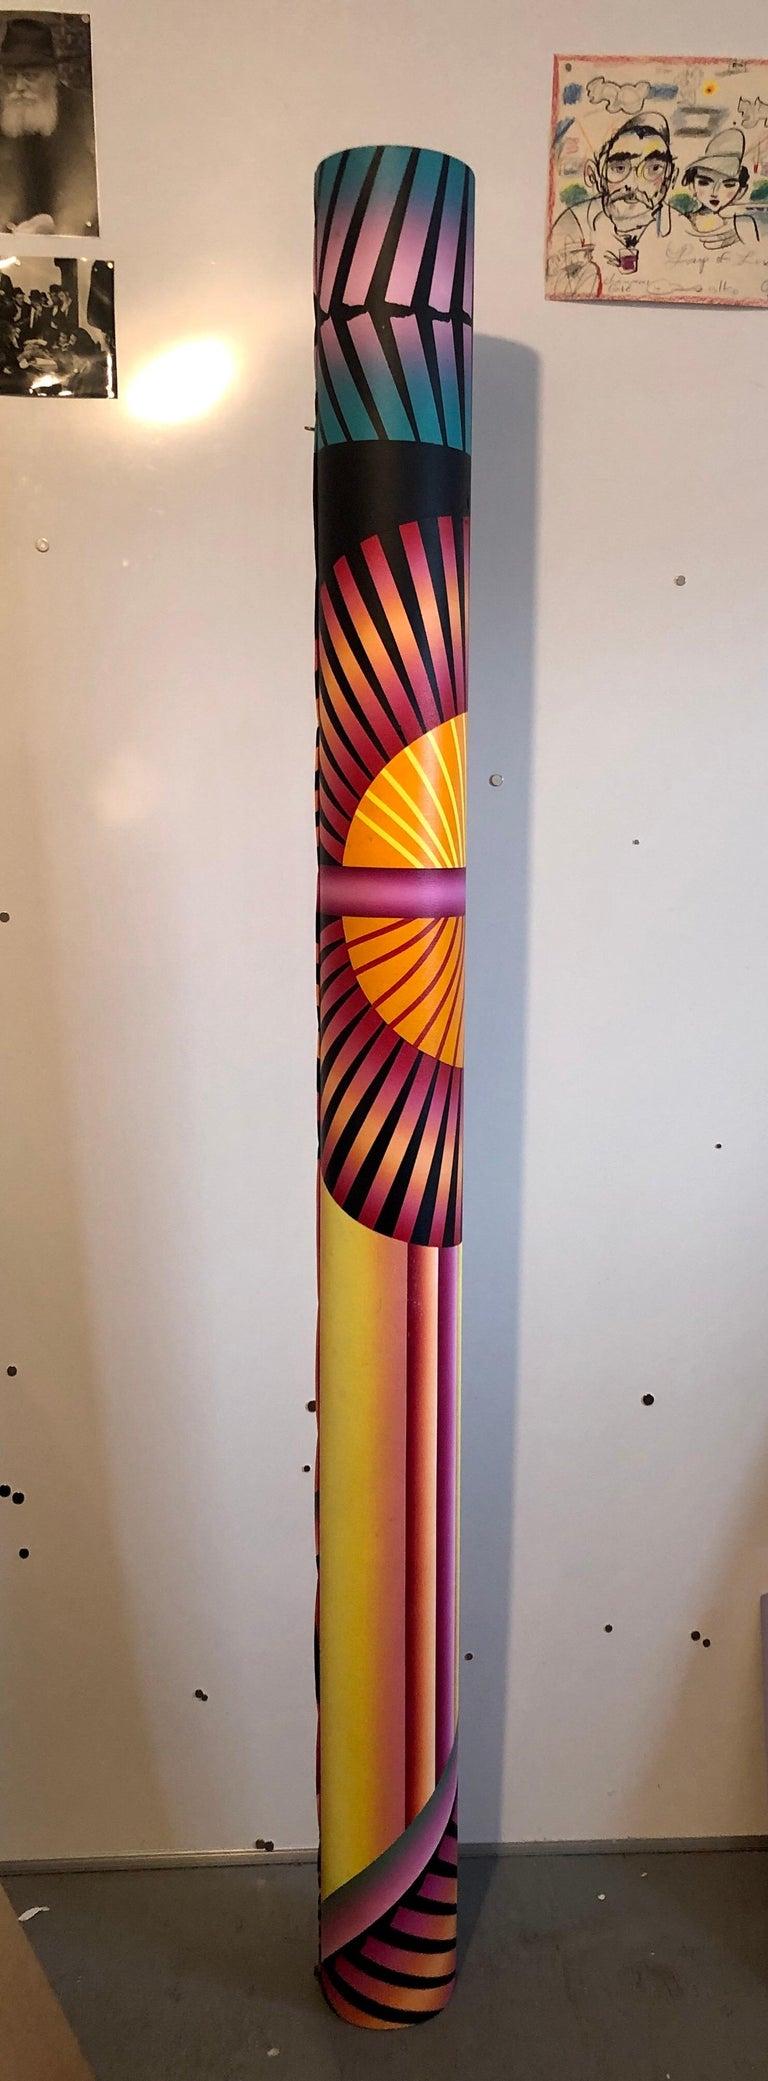 Abstract Geometric Shaped Canvas Painting Sculpture Memphis Milano Era 1980s Art 12